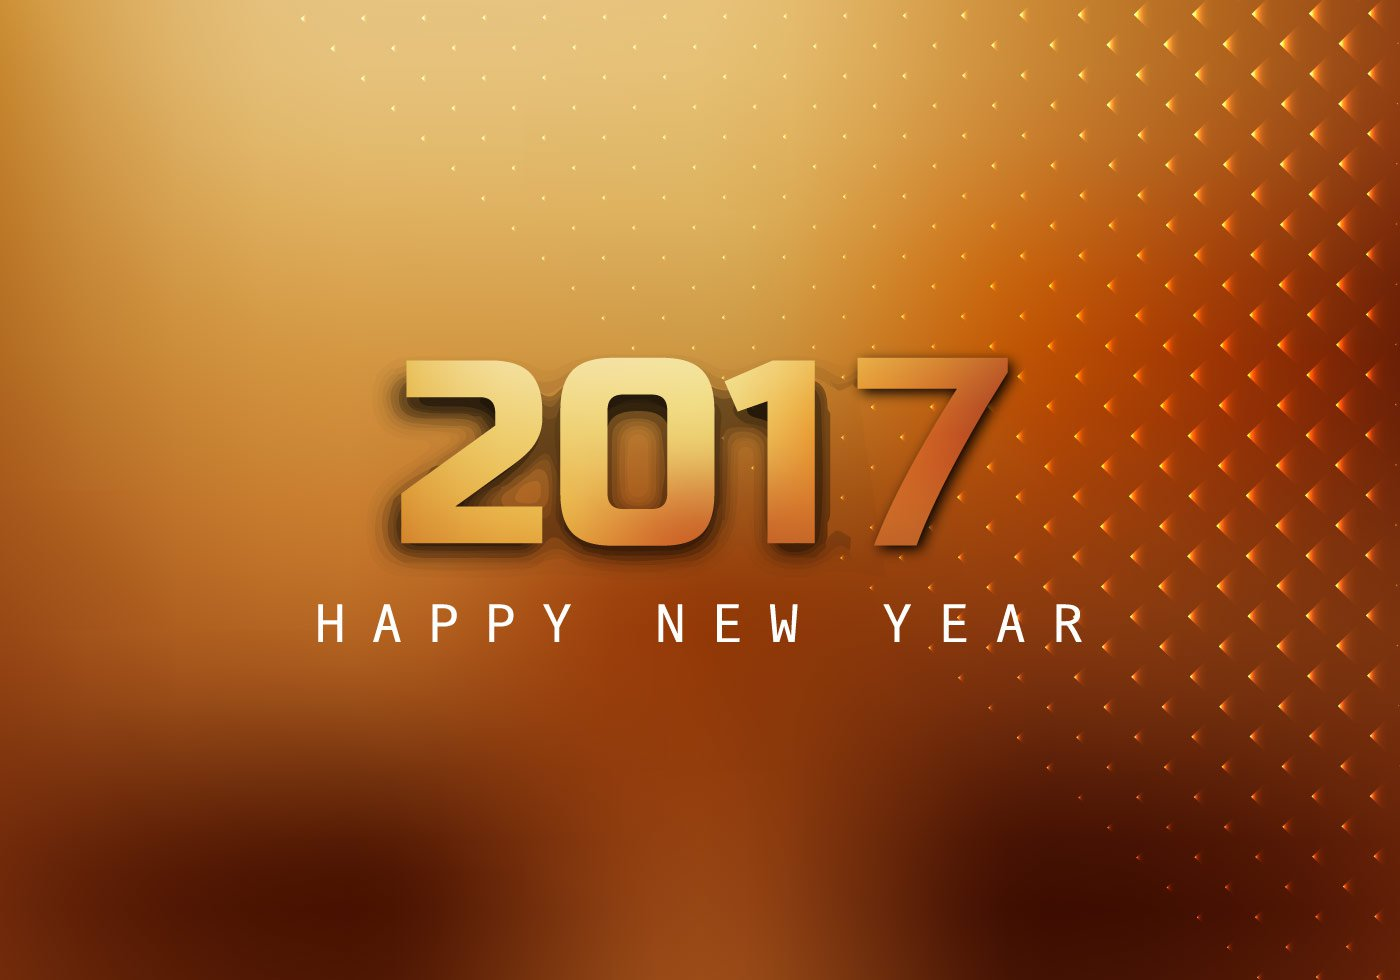 40 Beautiful Happy New Year 2017 Wallpaper